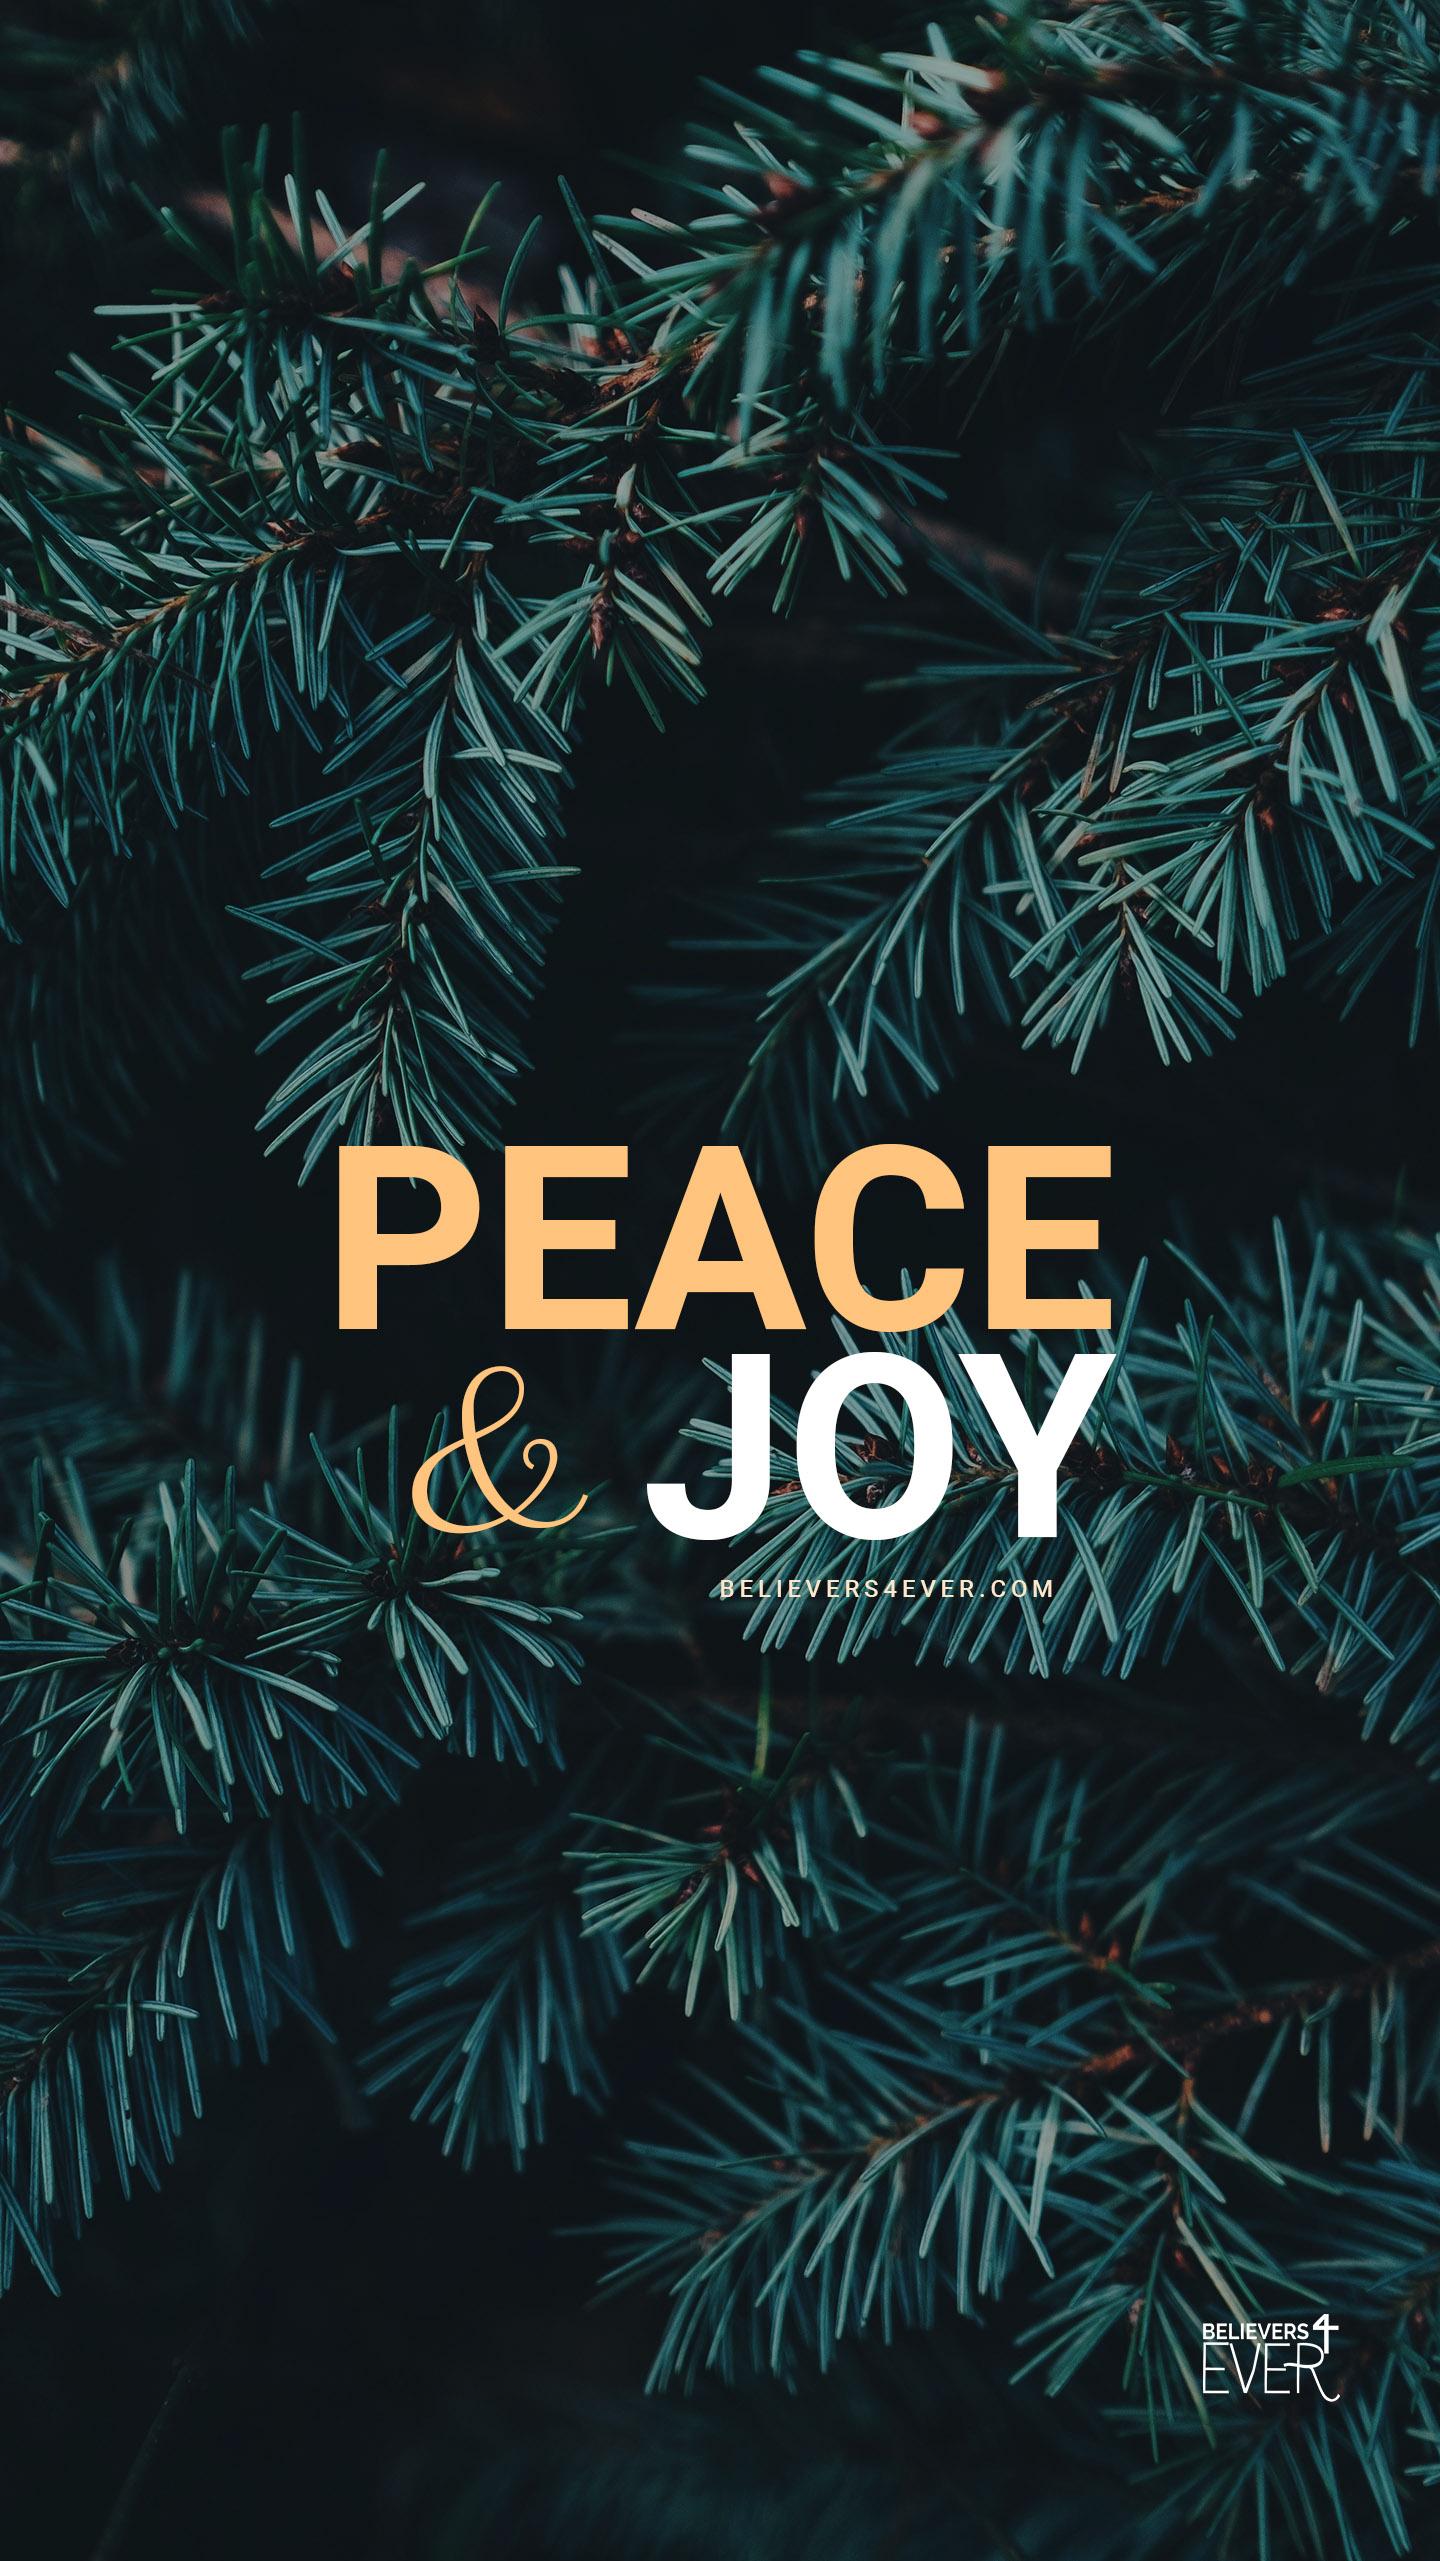 Peace & Joy mobile wallpaper